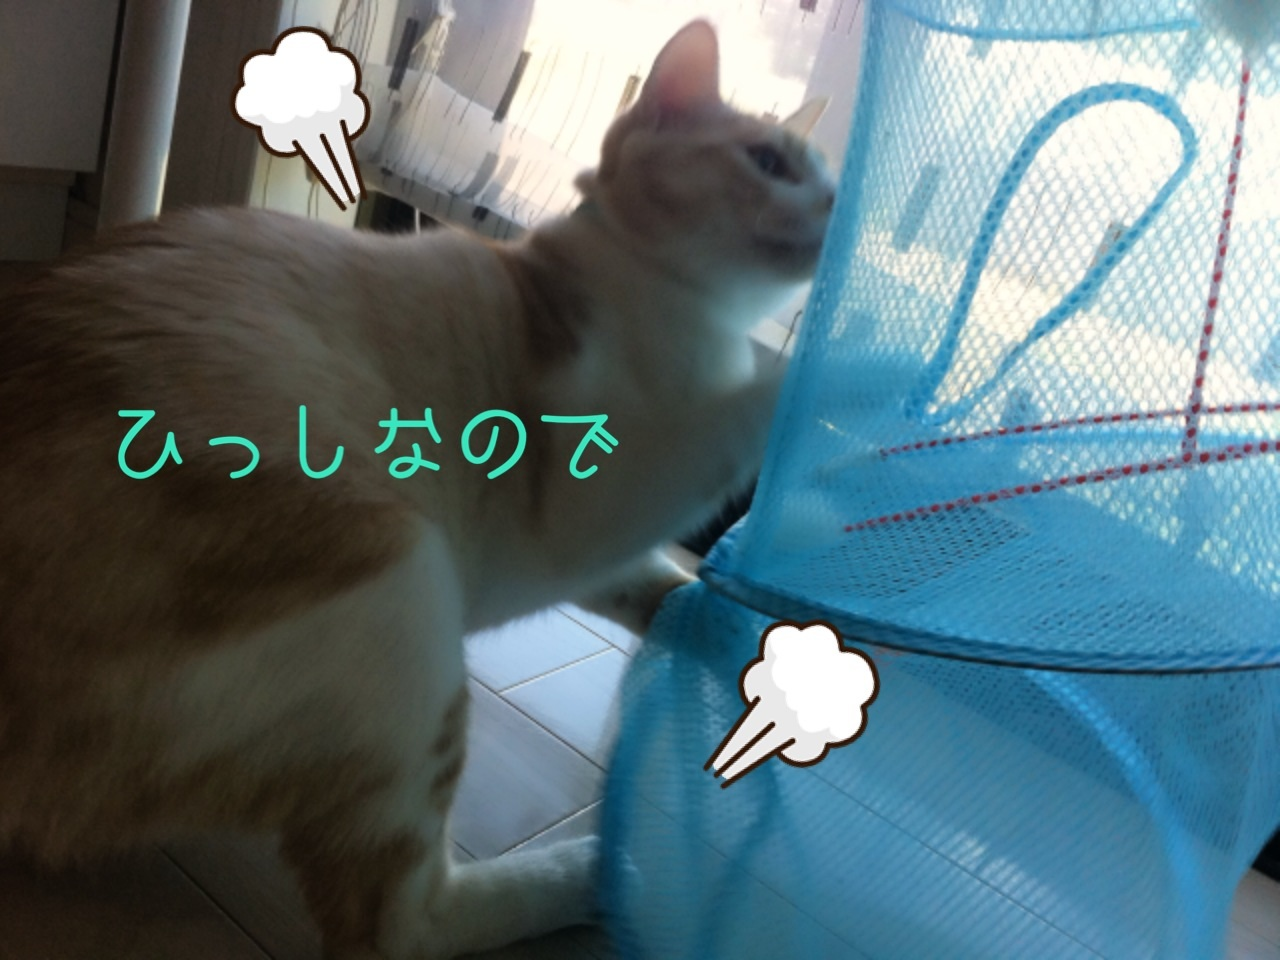 image_20130804201257935.jpg